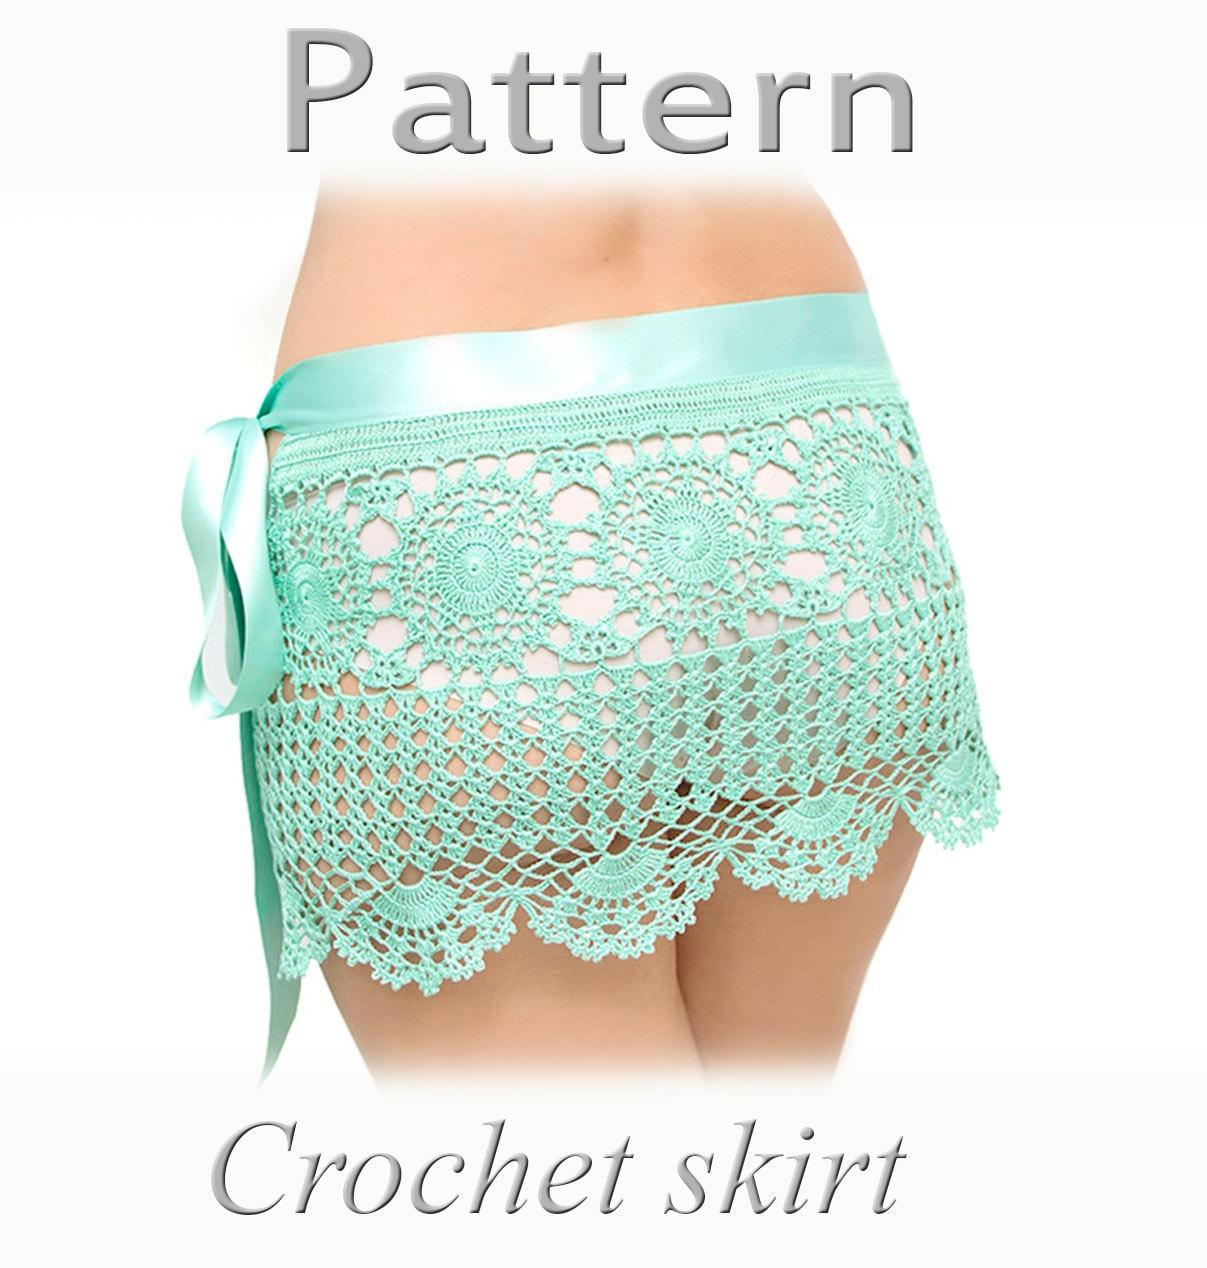 Free Download Crochet Skirt Pattern : Crochet beach skirt PATTERN PDF crochet cover up